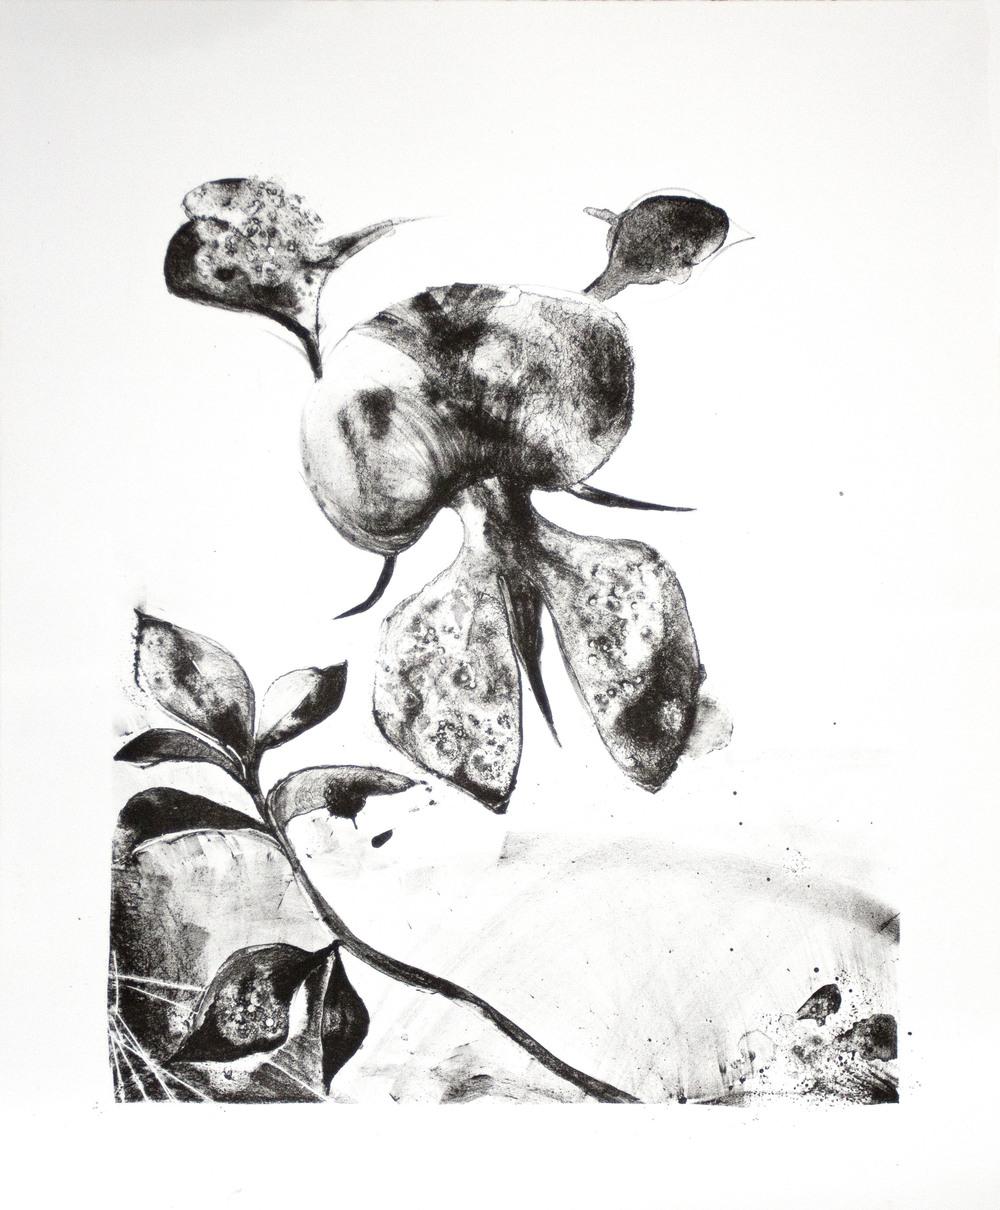 Fabaceae - Indigofera   Lithograph. 2016  55 x 45cm  $500 (UF)